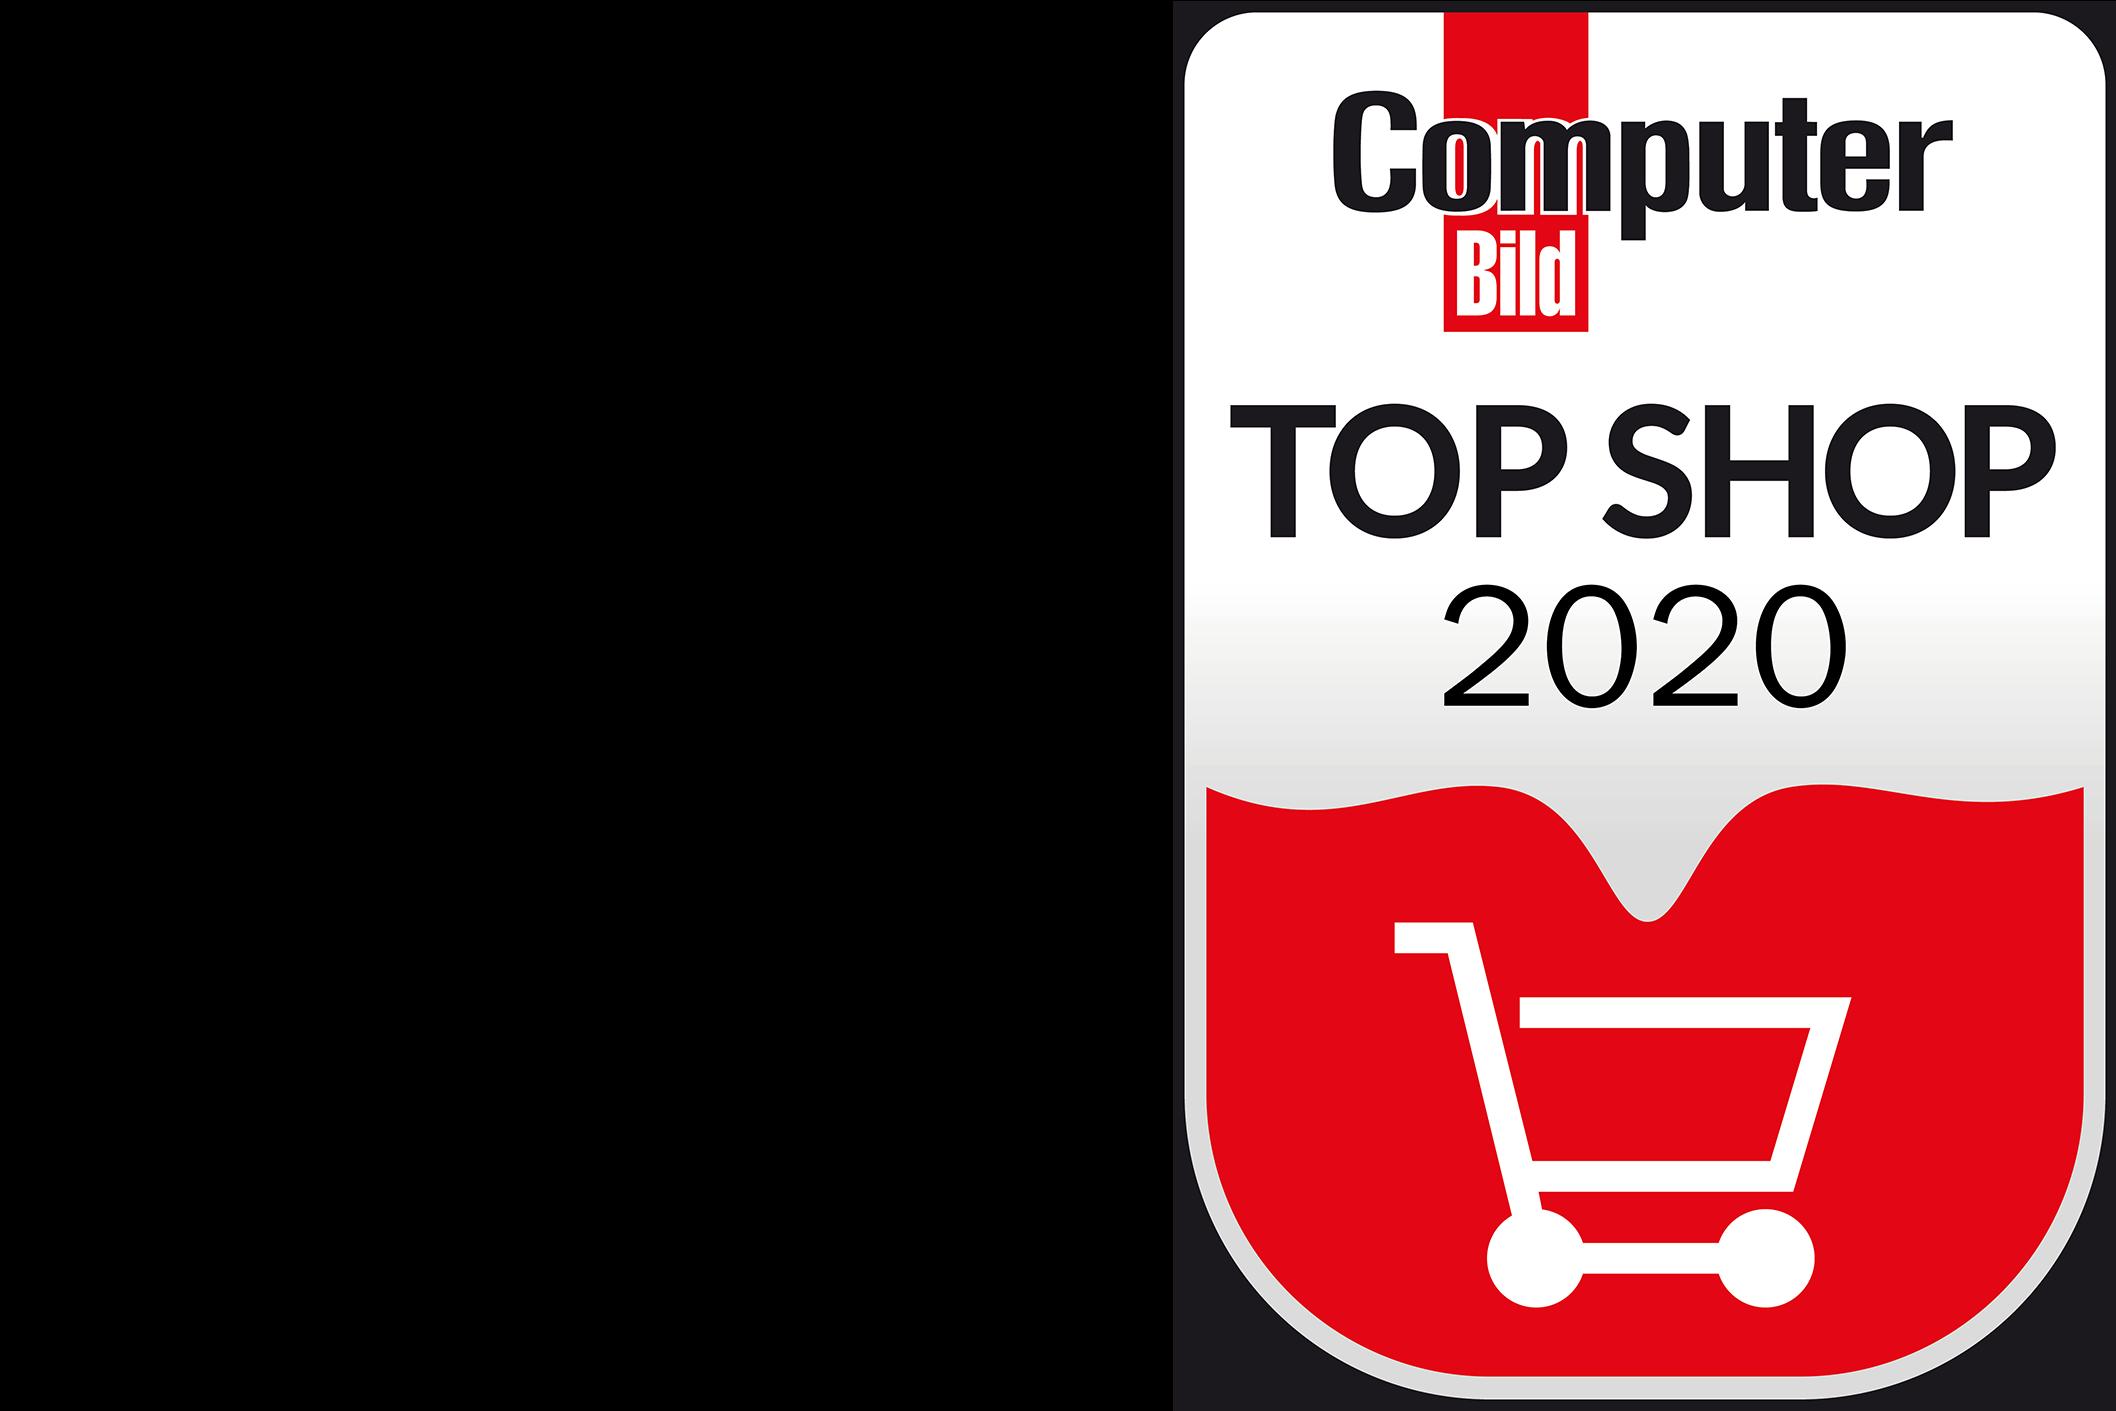 Computer Bild Tpo Shop 2020